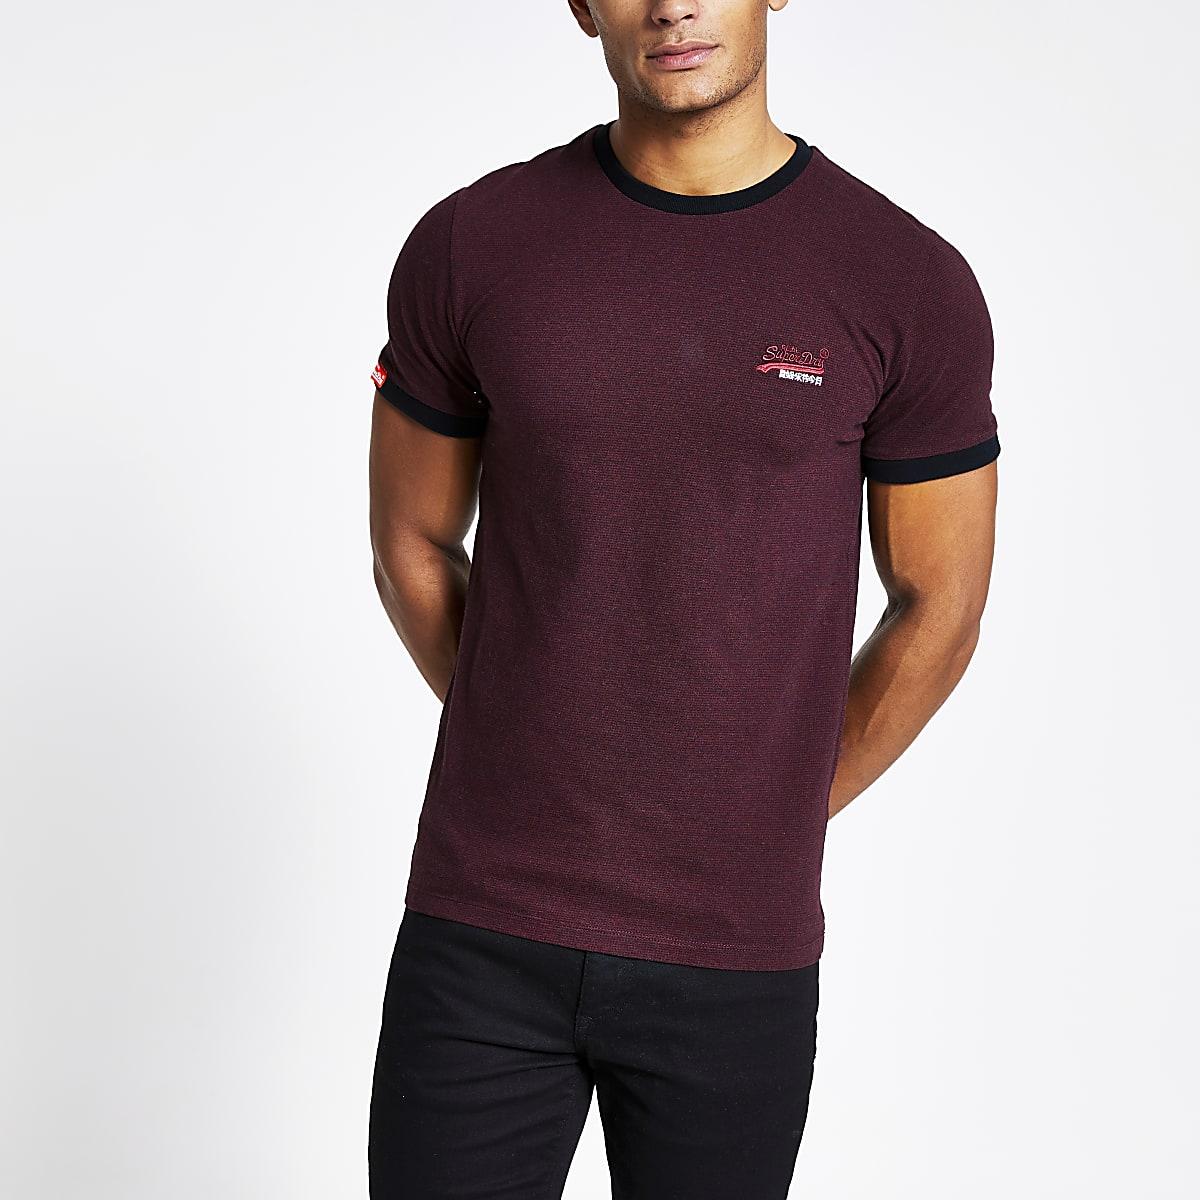 SuperdryOrange Label - T-shirt rouge foncé